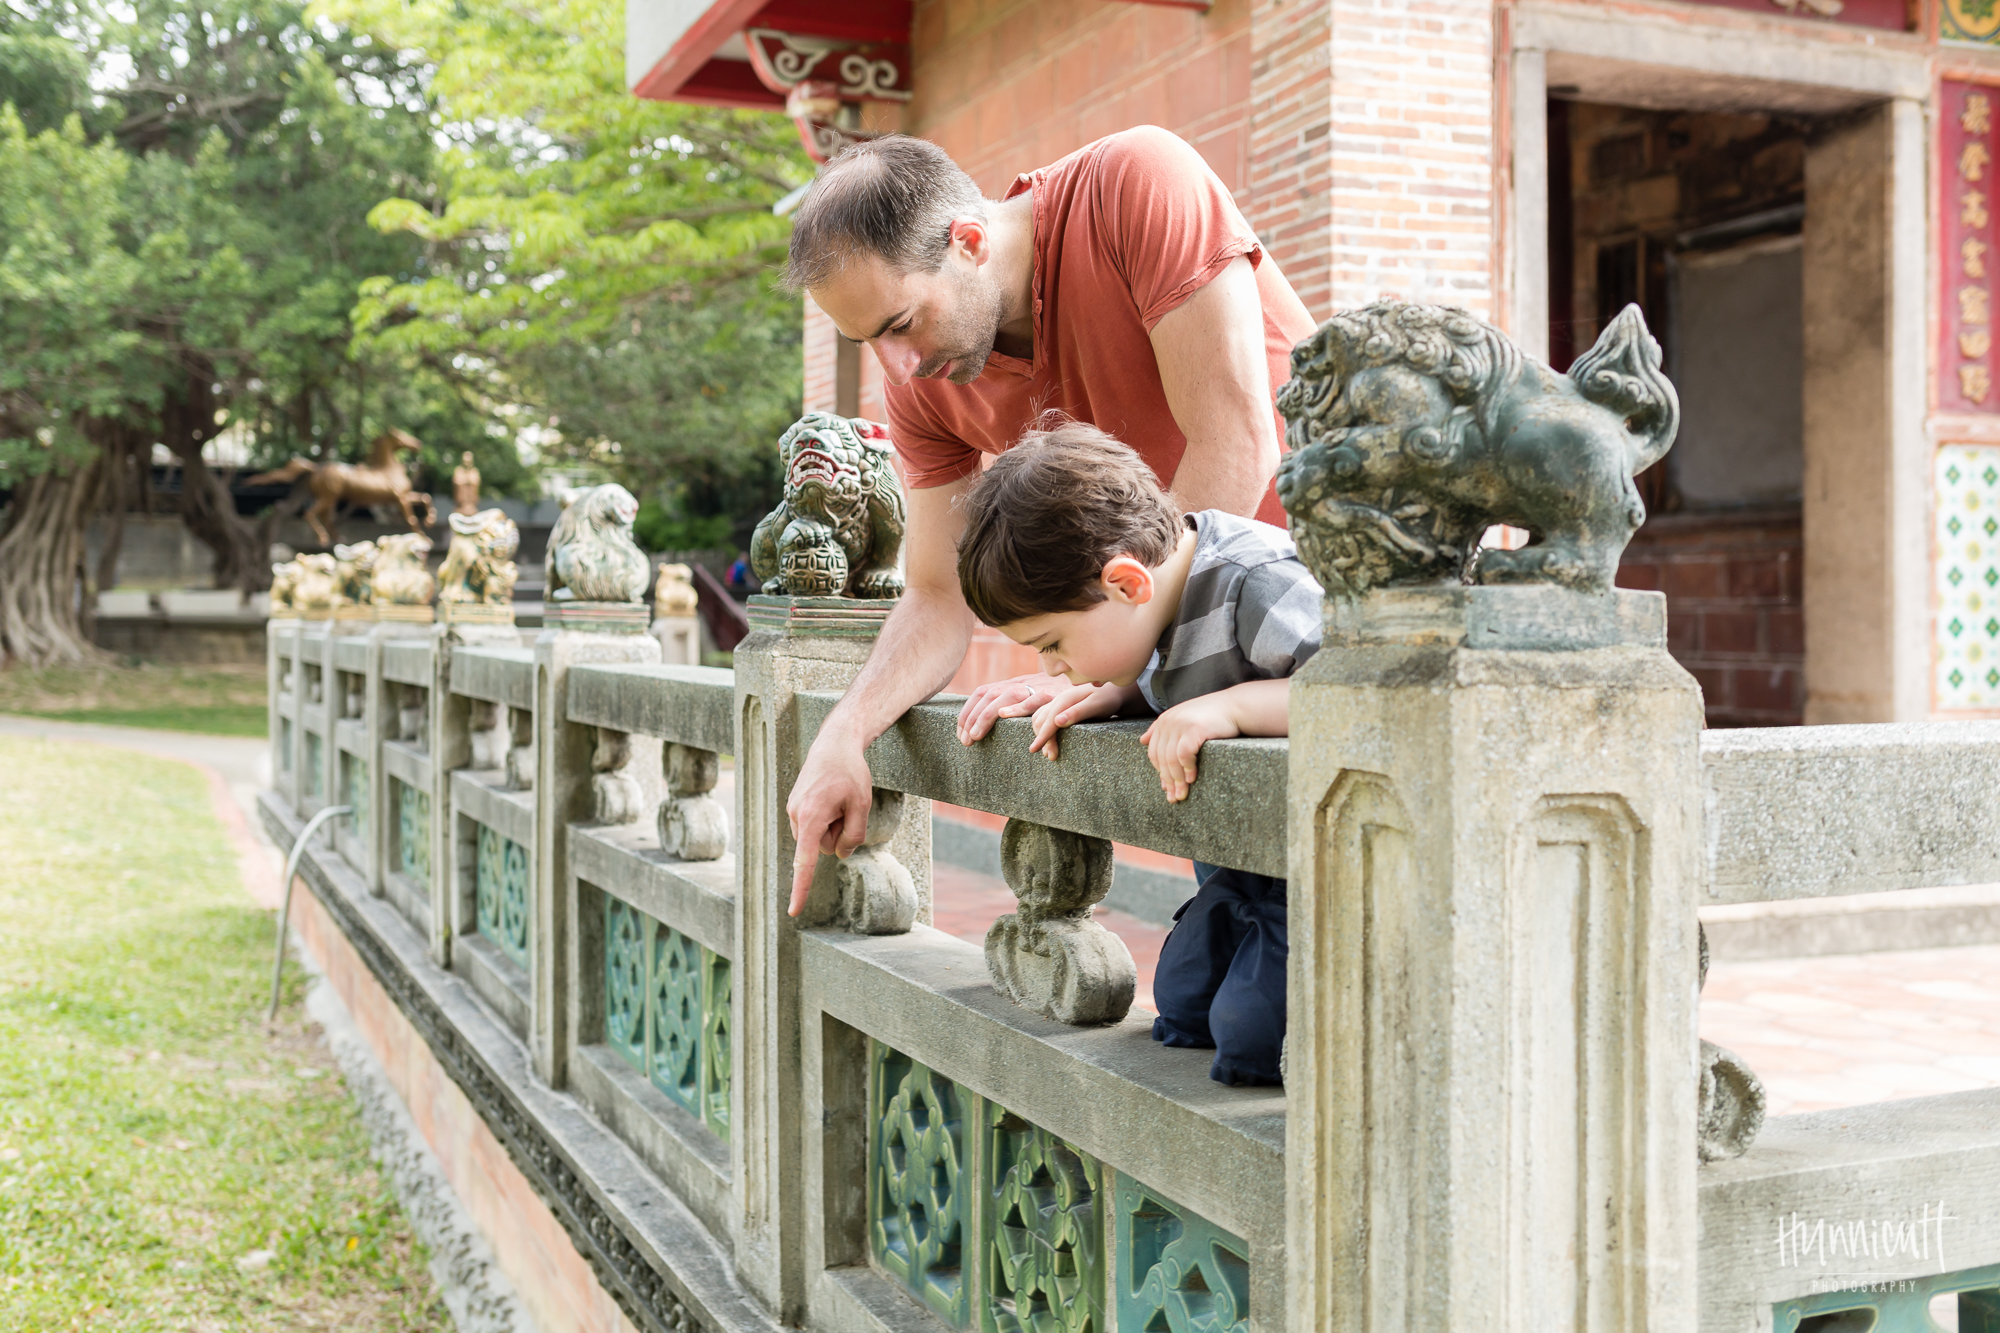 Family-Outdoor-Lifestyle-Modern-Urban-Travel-Culture-HunnicuttPhotography-RebeccaHunnicuttFarren-Taichung-Taiwan